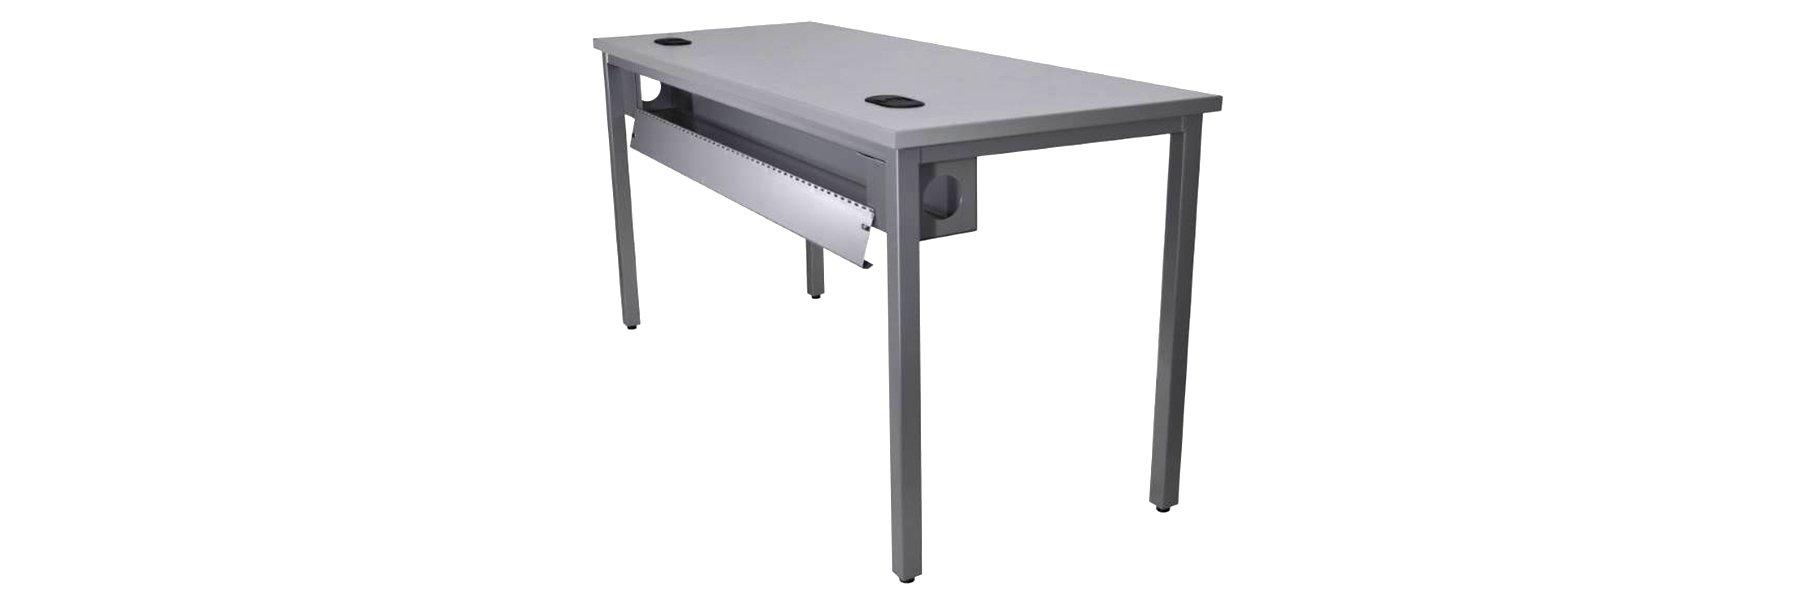 Corilam 9000 Series Computer Desk